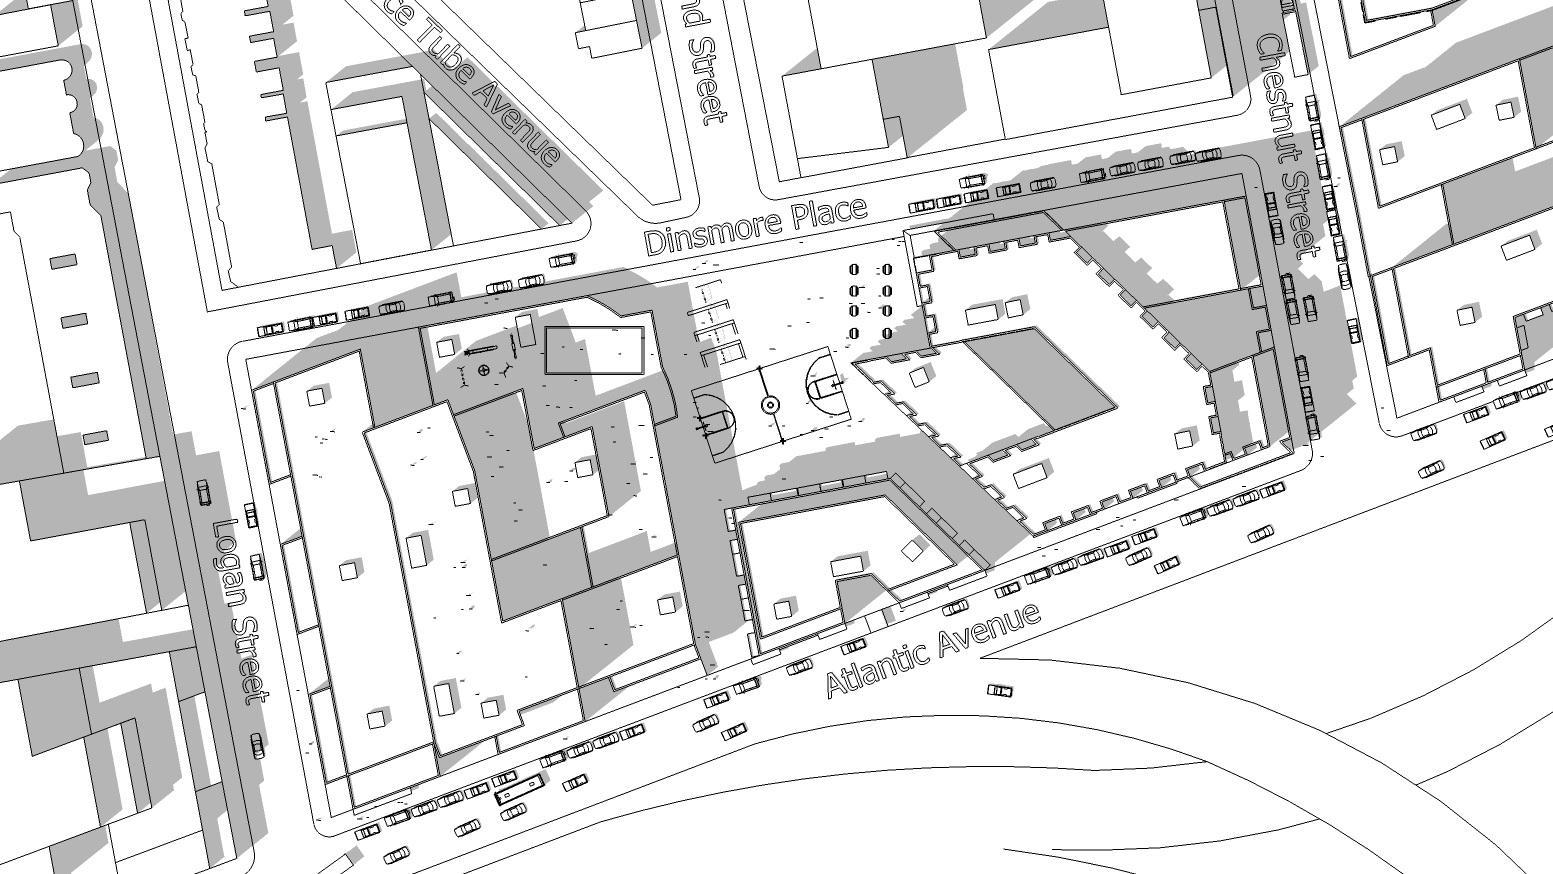 Socio-spatial Relationships Study: Site Plan